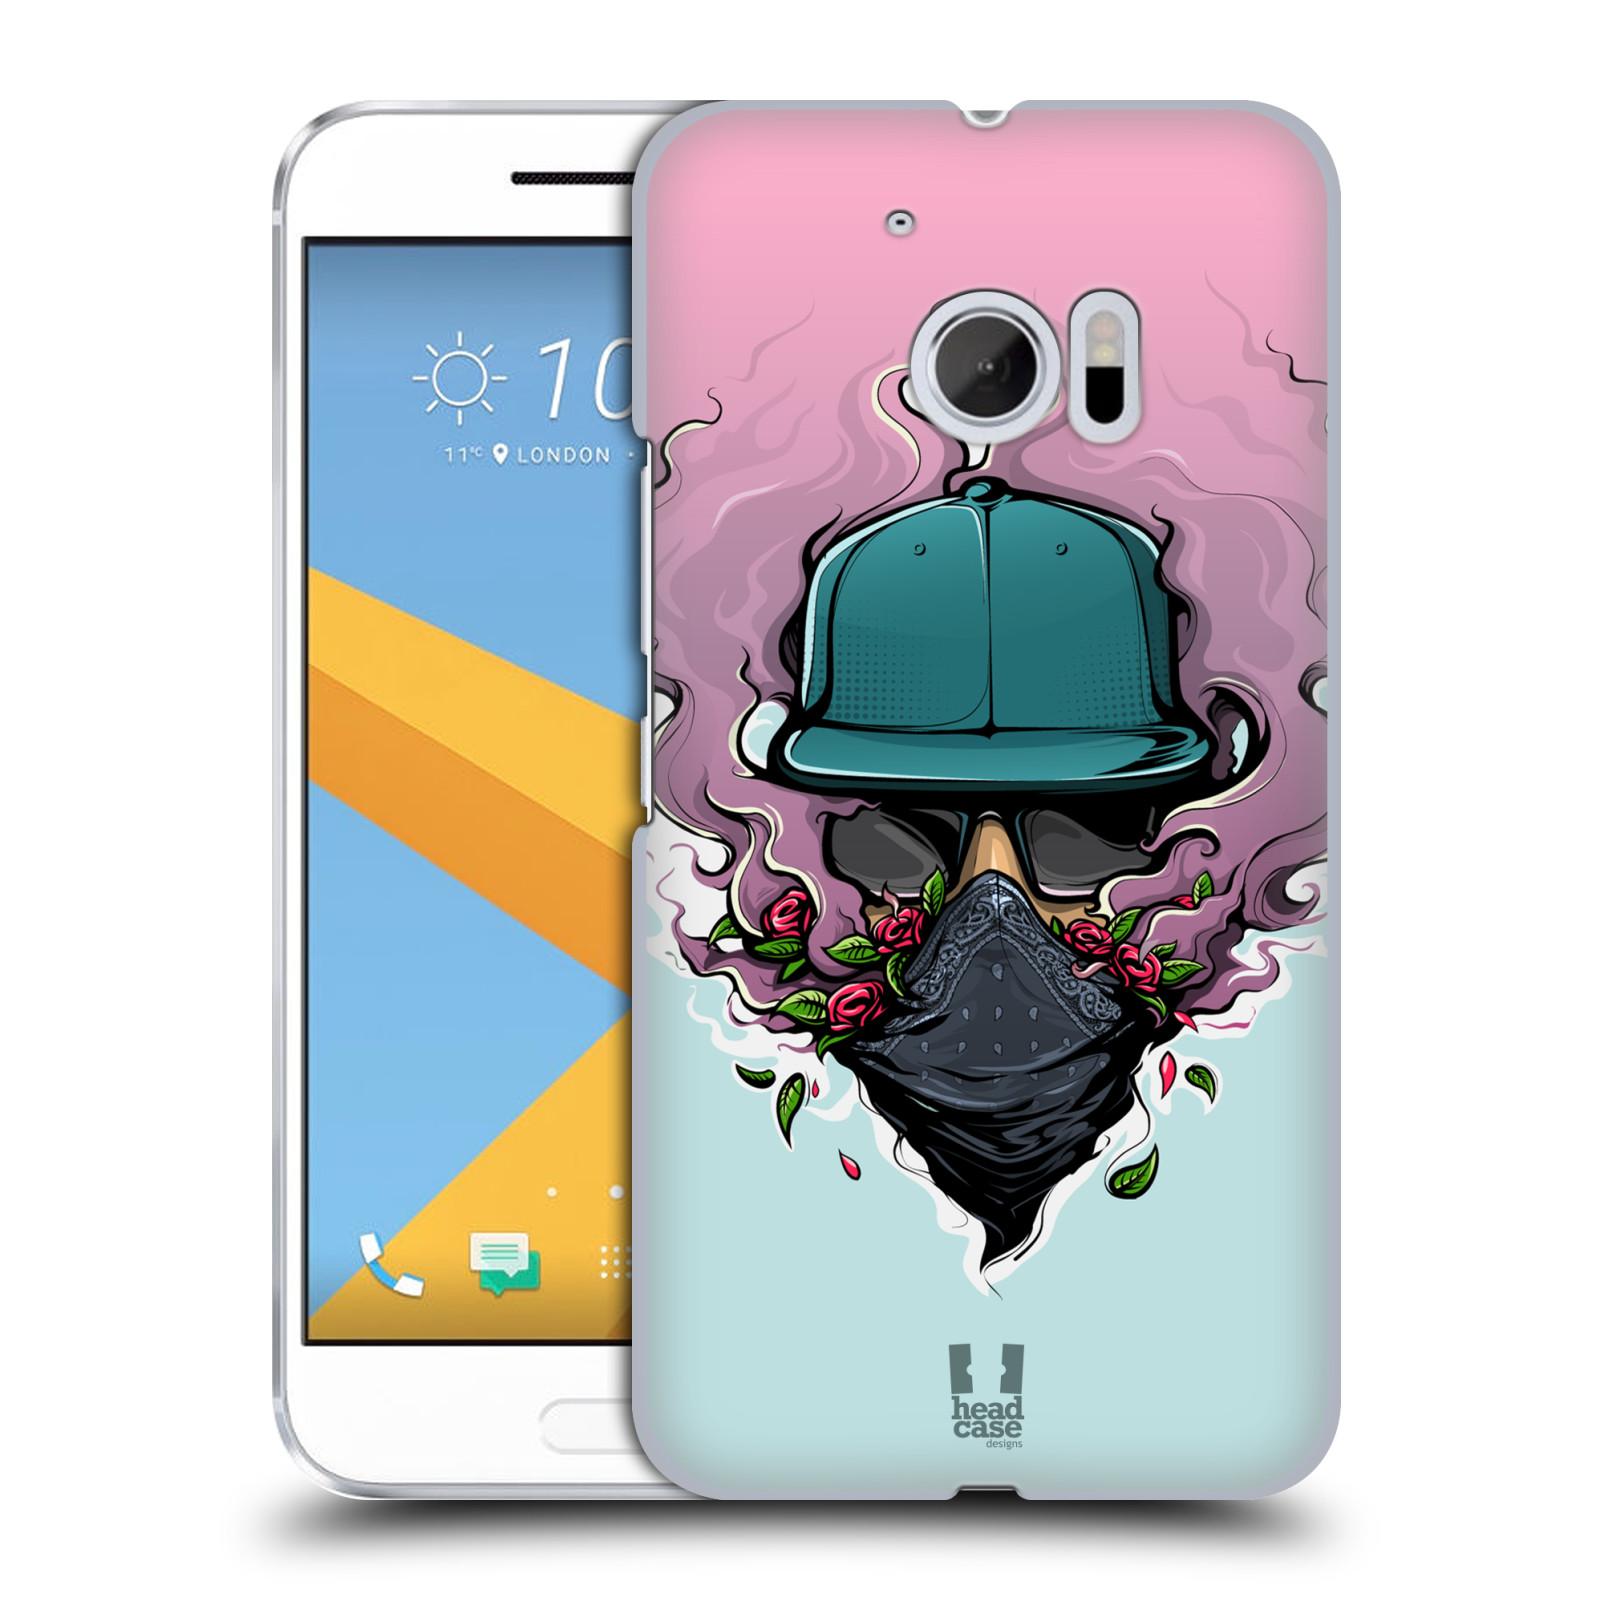 Case Designs urbano VIBES duro HEAD volver estuche para HTC 10